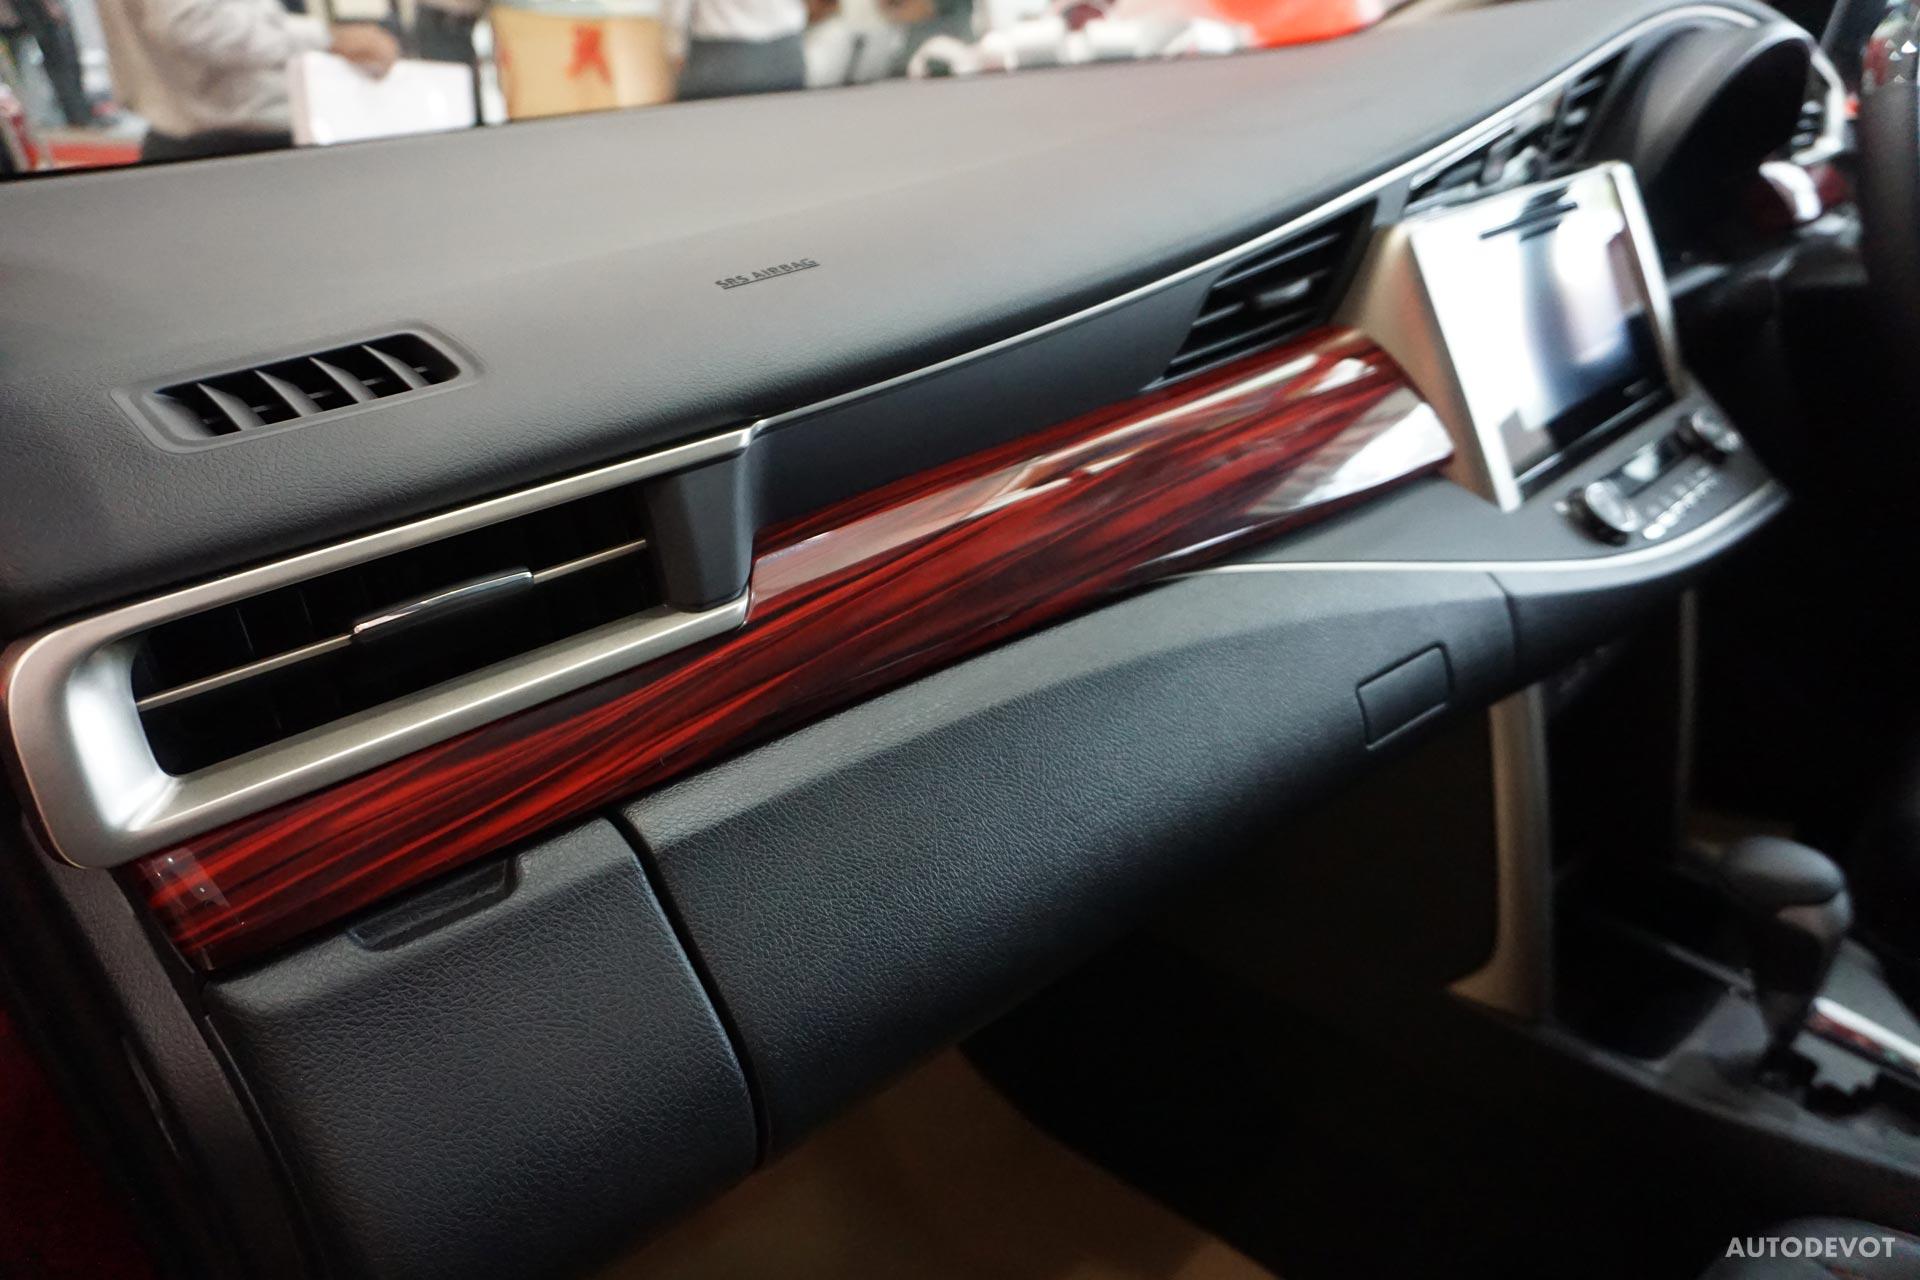 Toyota-Innova-Touring-Sport-interior-6